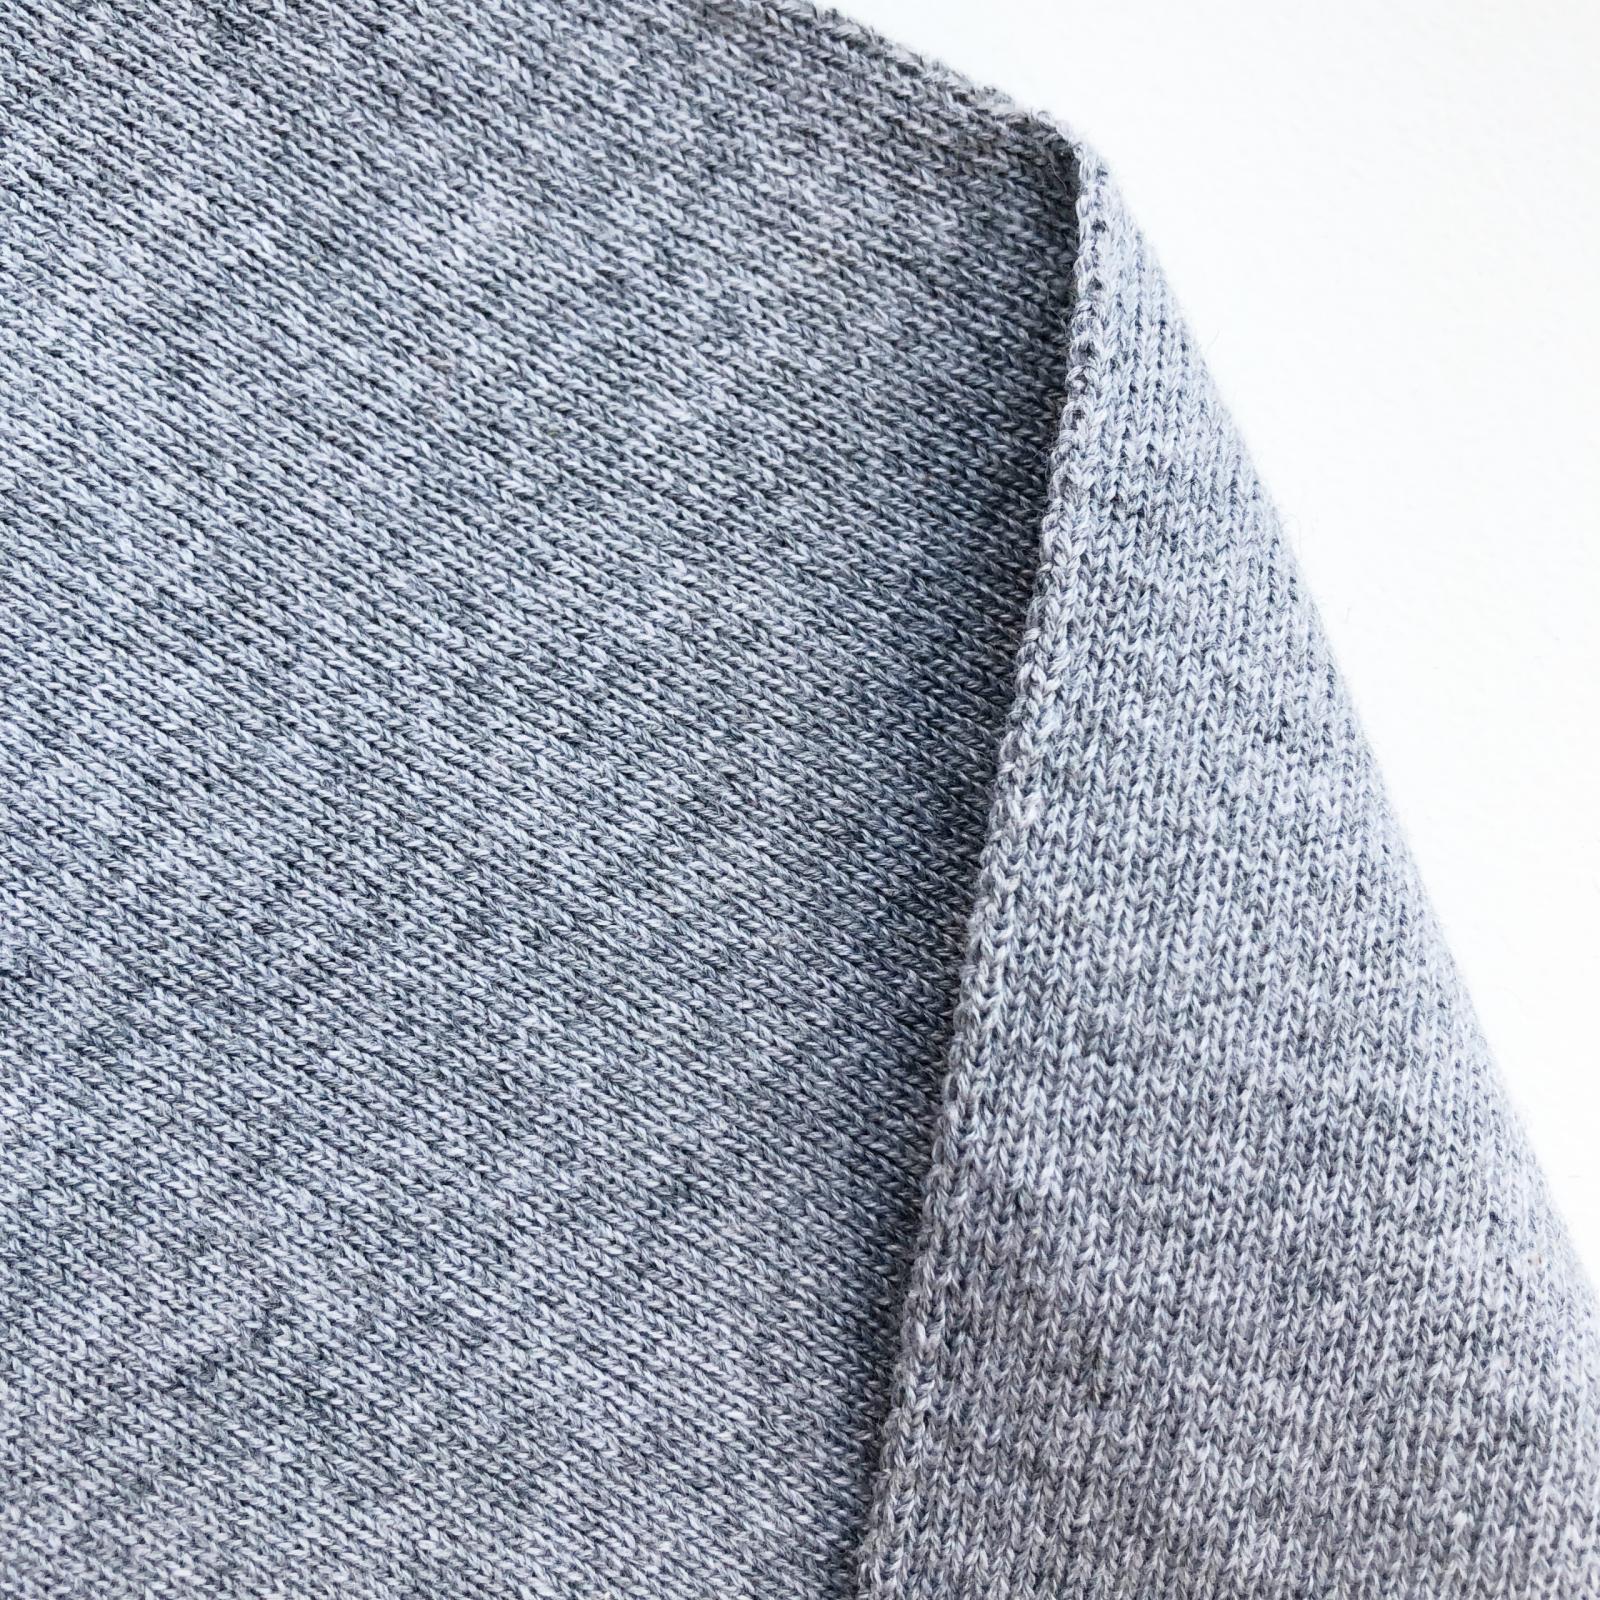 Designer Deadstock Spun Rayon Heavyweight Sweatshirt 1x1 Rib Knit  - 1/4 yard cut - Various Colors